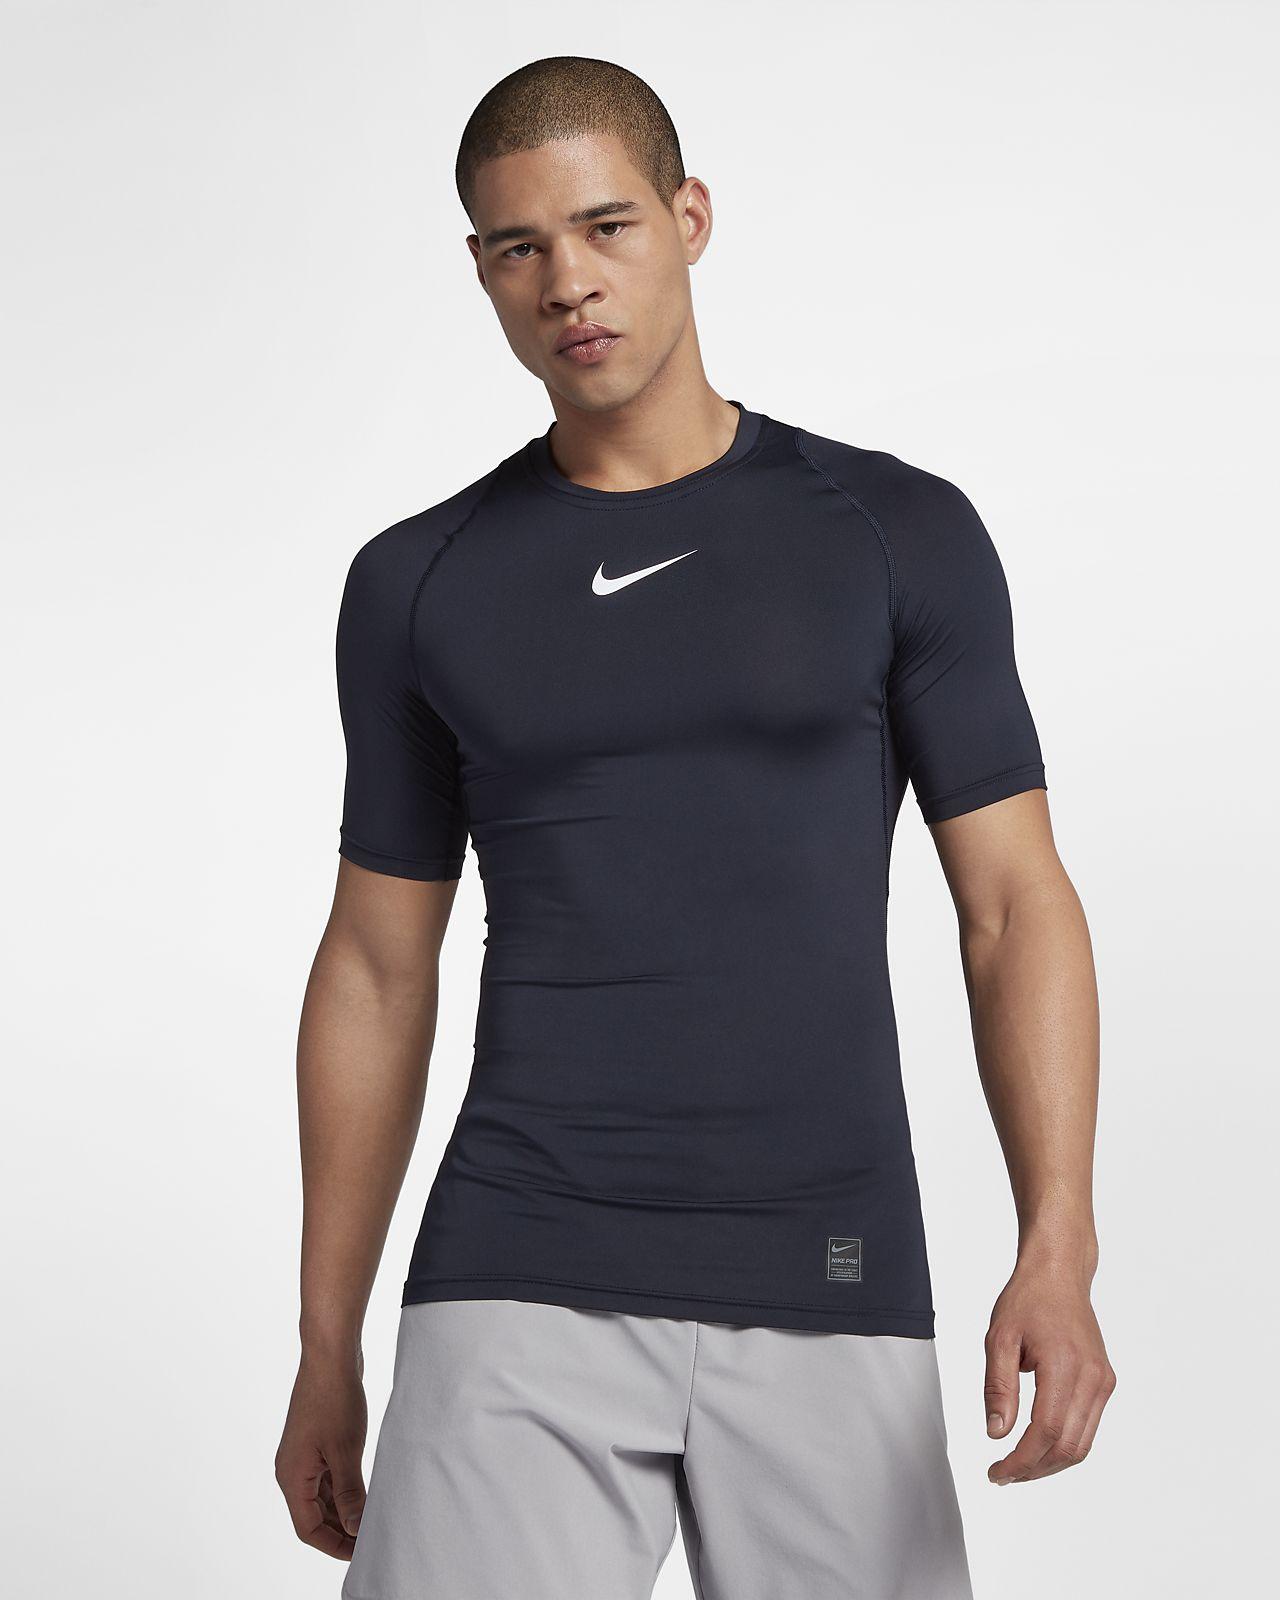 Nike Pro rövid ujjú férfi edzőfelső